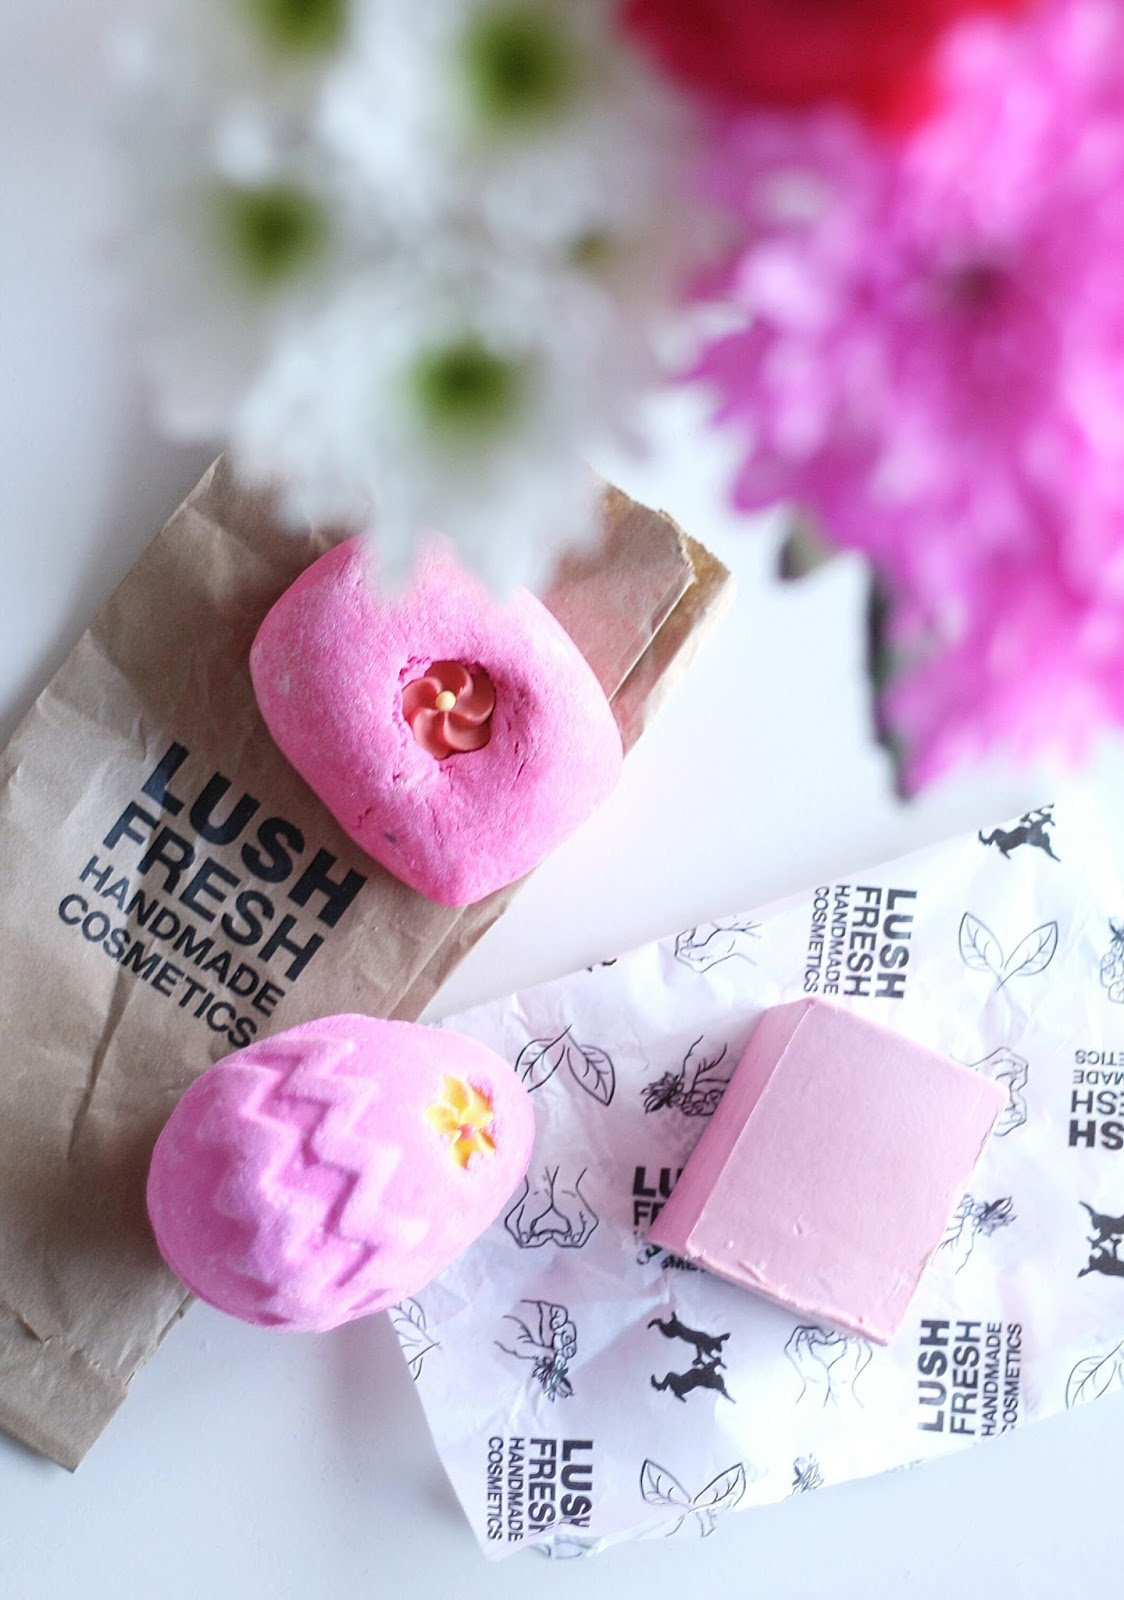 Lush-Easter-bath-bomb-bubble-bar-soap